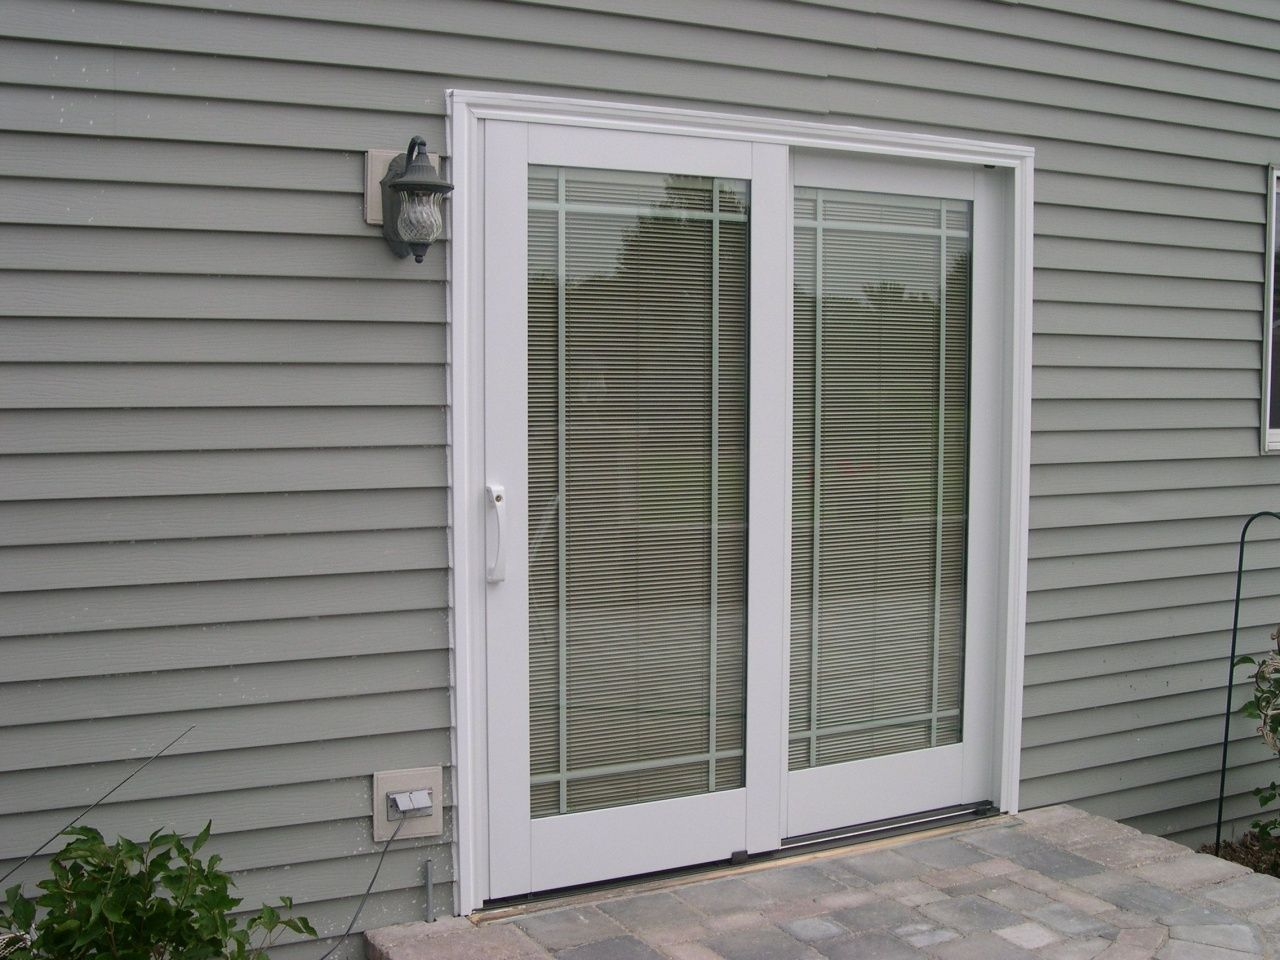 Vertical Blinds For Sliding Glass Doors Lowes In 2020 Sliding Glass Doors Patio Patio Door Blinds Glass Doors Patio